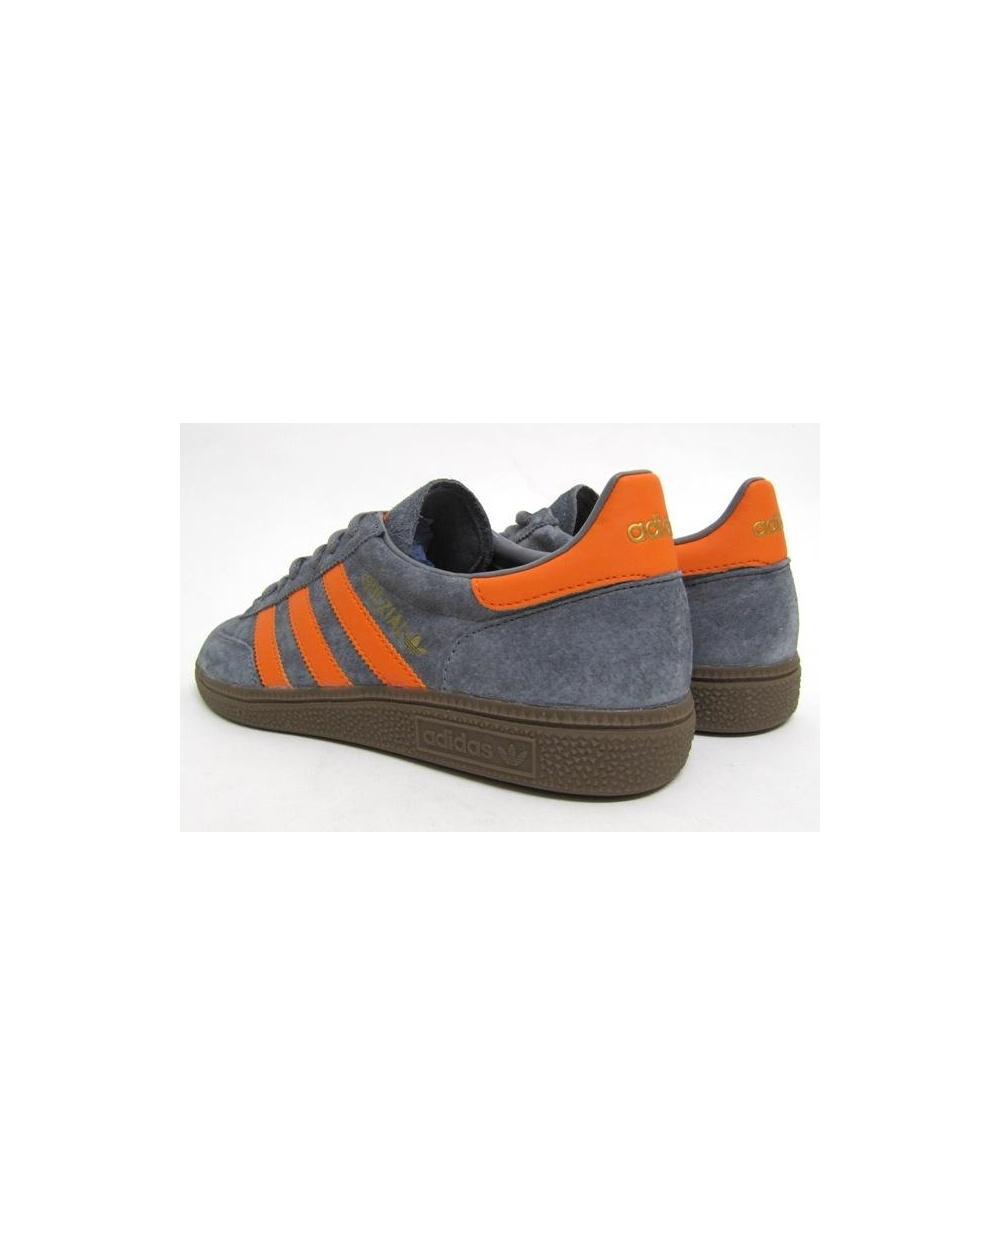 premium selection 4cc0b 81d39 ... Adidas Spezial Trainers Grey Orange ...